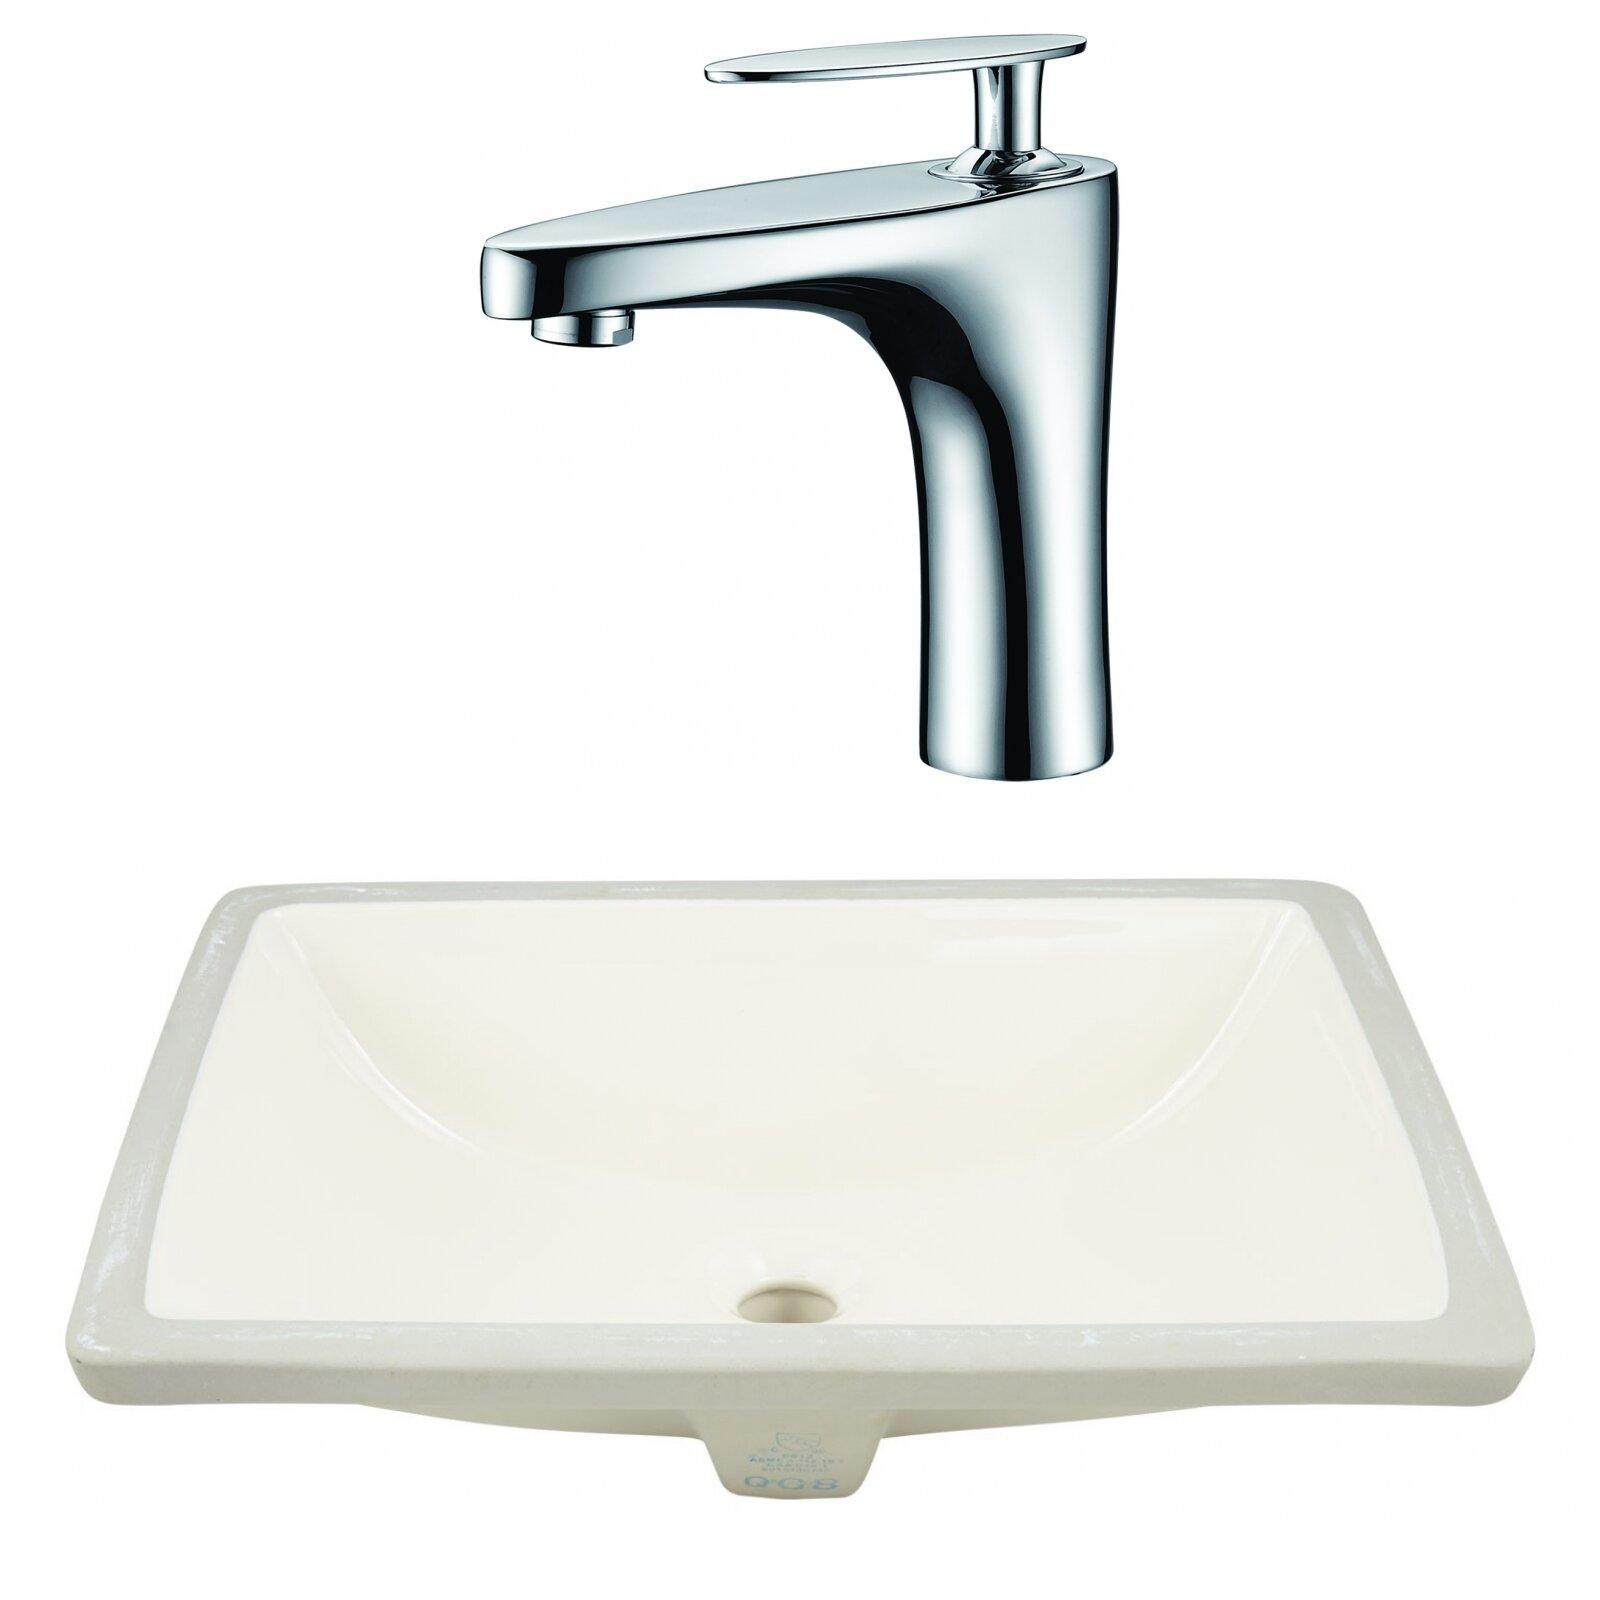 Royalpurplebathkitchen Csa Ceramic Rectangular Undermount Bathroom Sink With Faucet And Overflow Wayfair